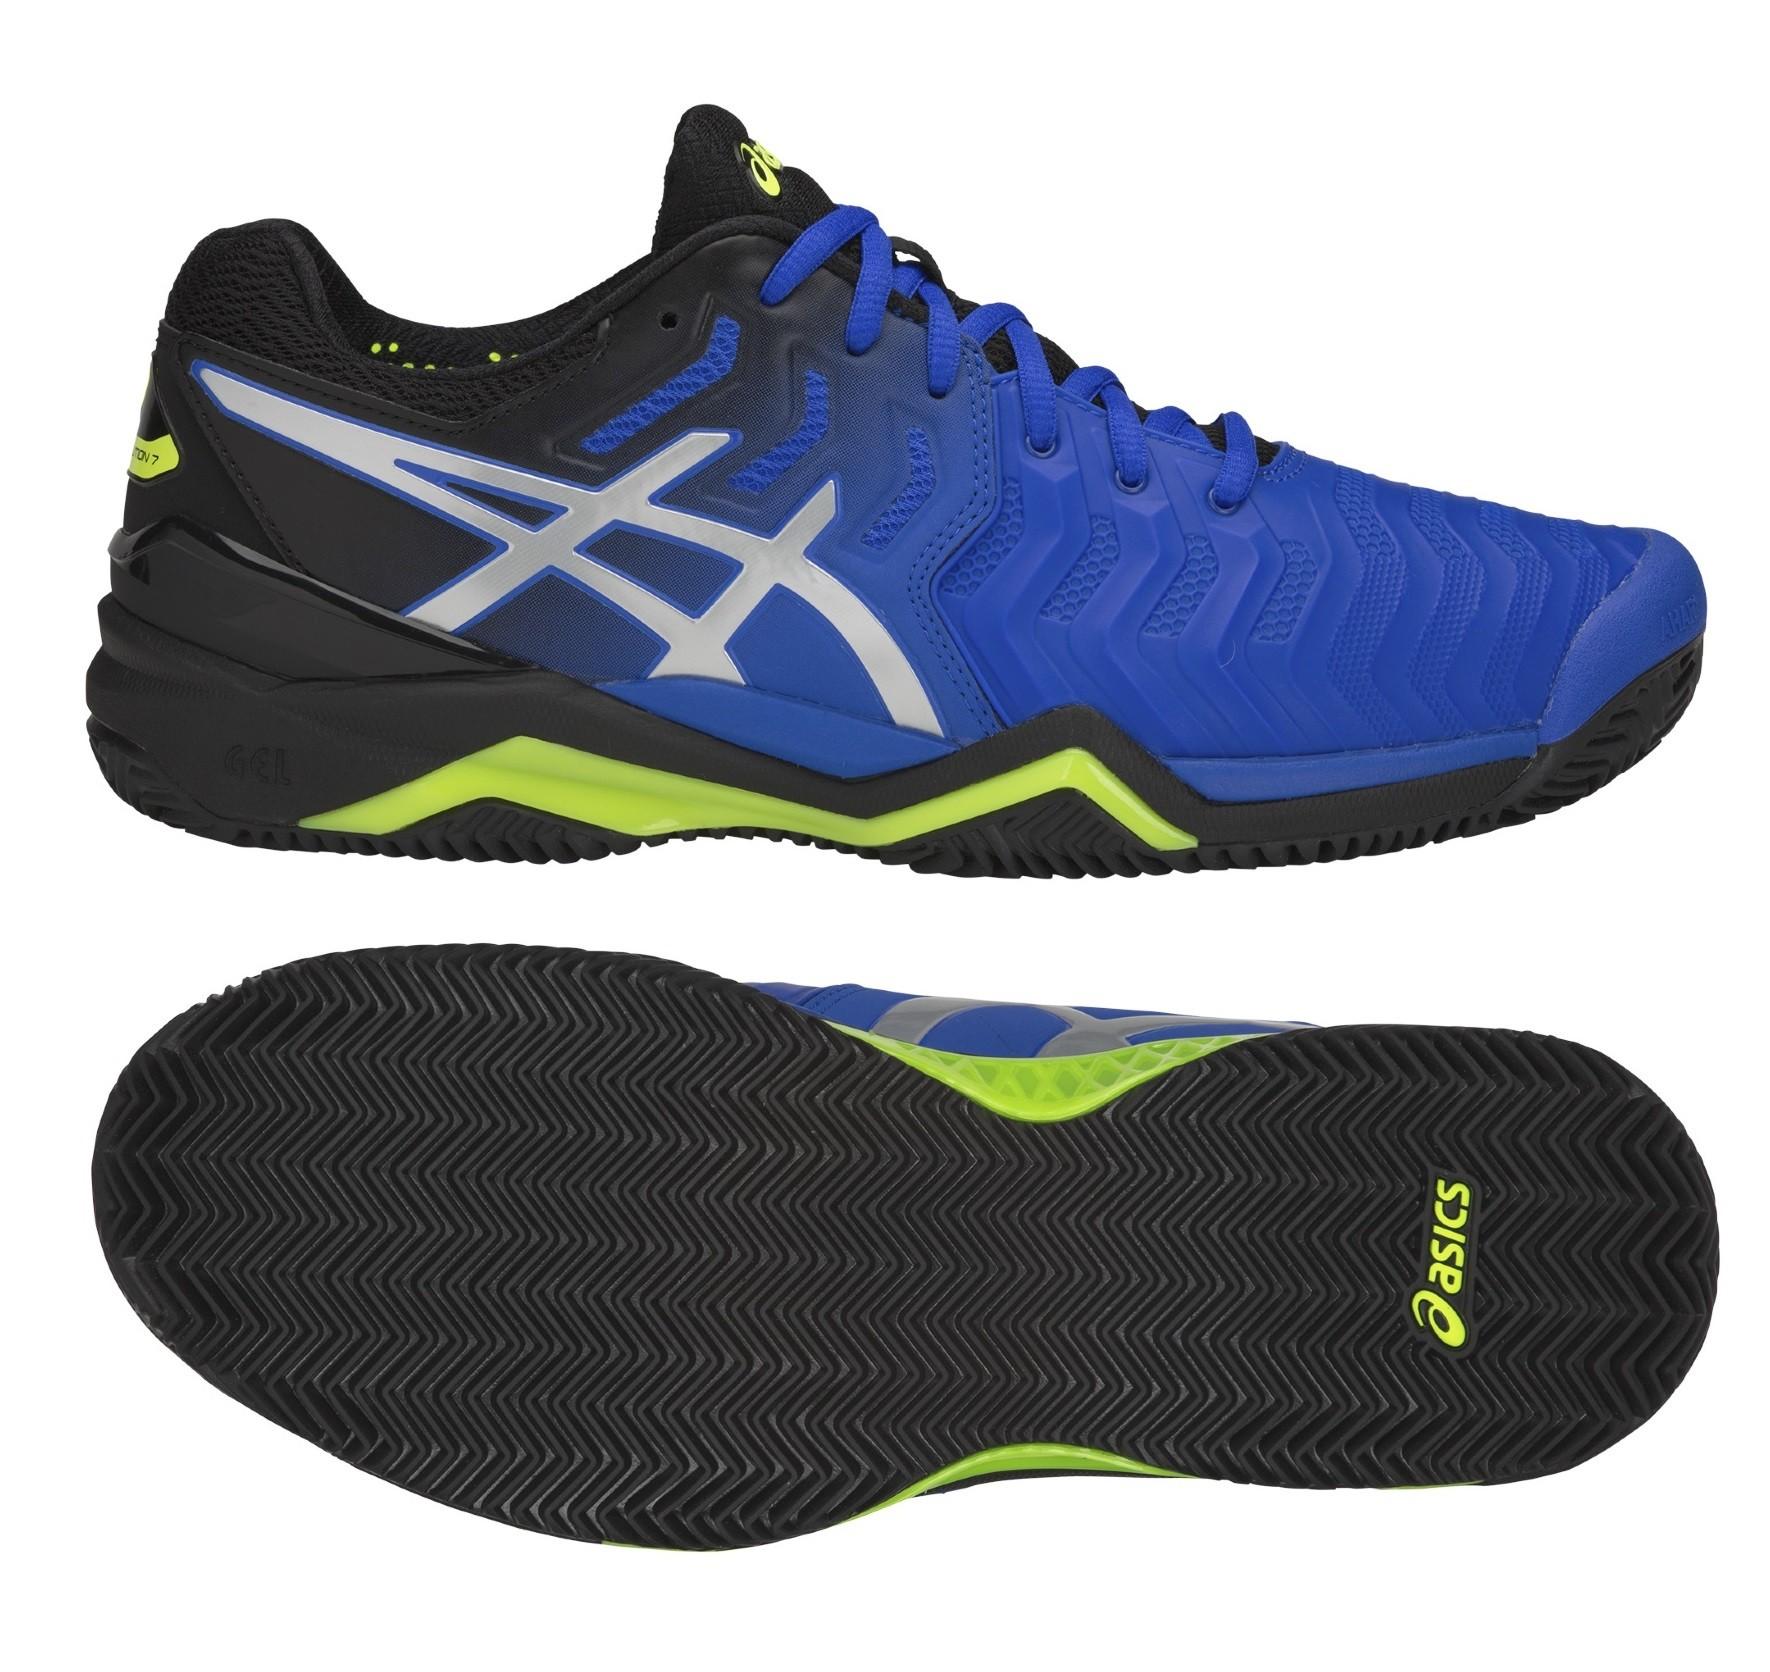 Pánská tenisová obuv Asics Gel Resolution 7 Clay E702Y-407 modré 136b20ce7dc